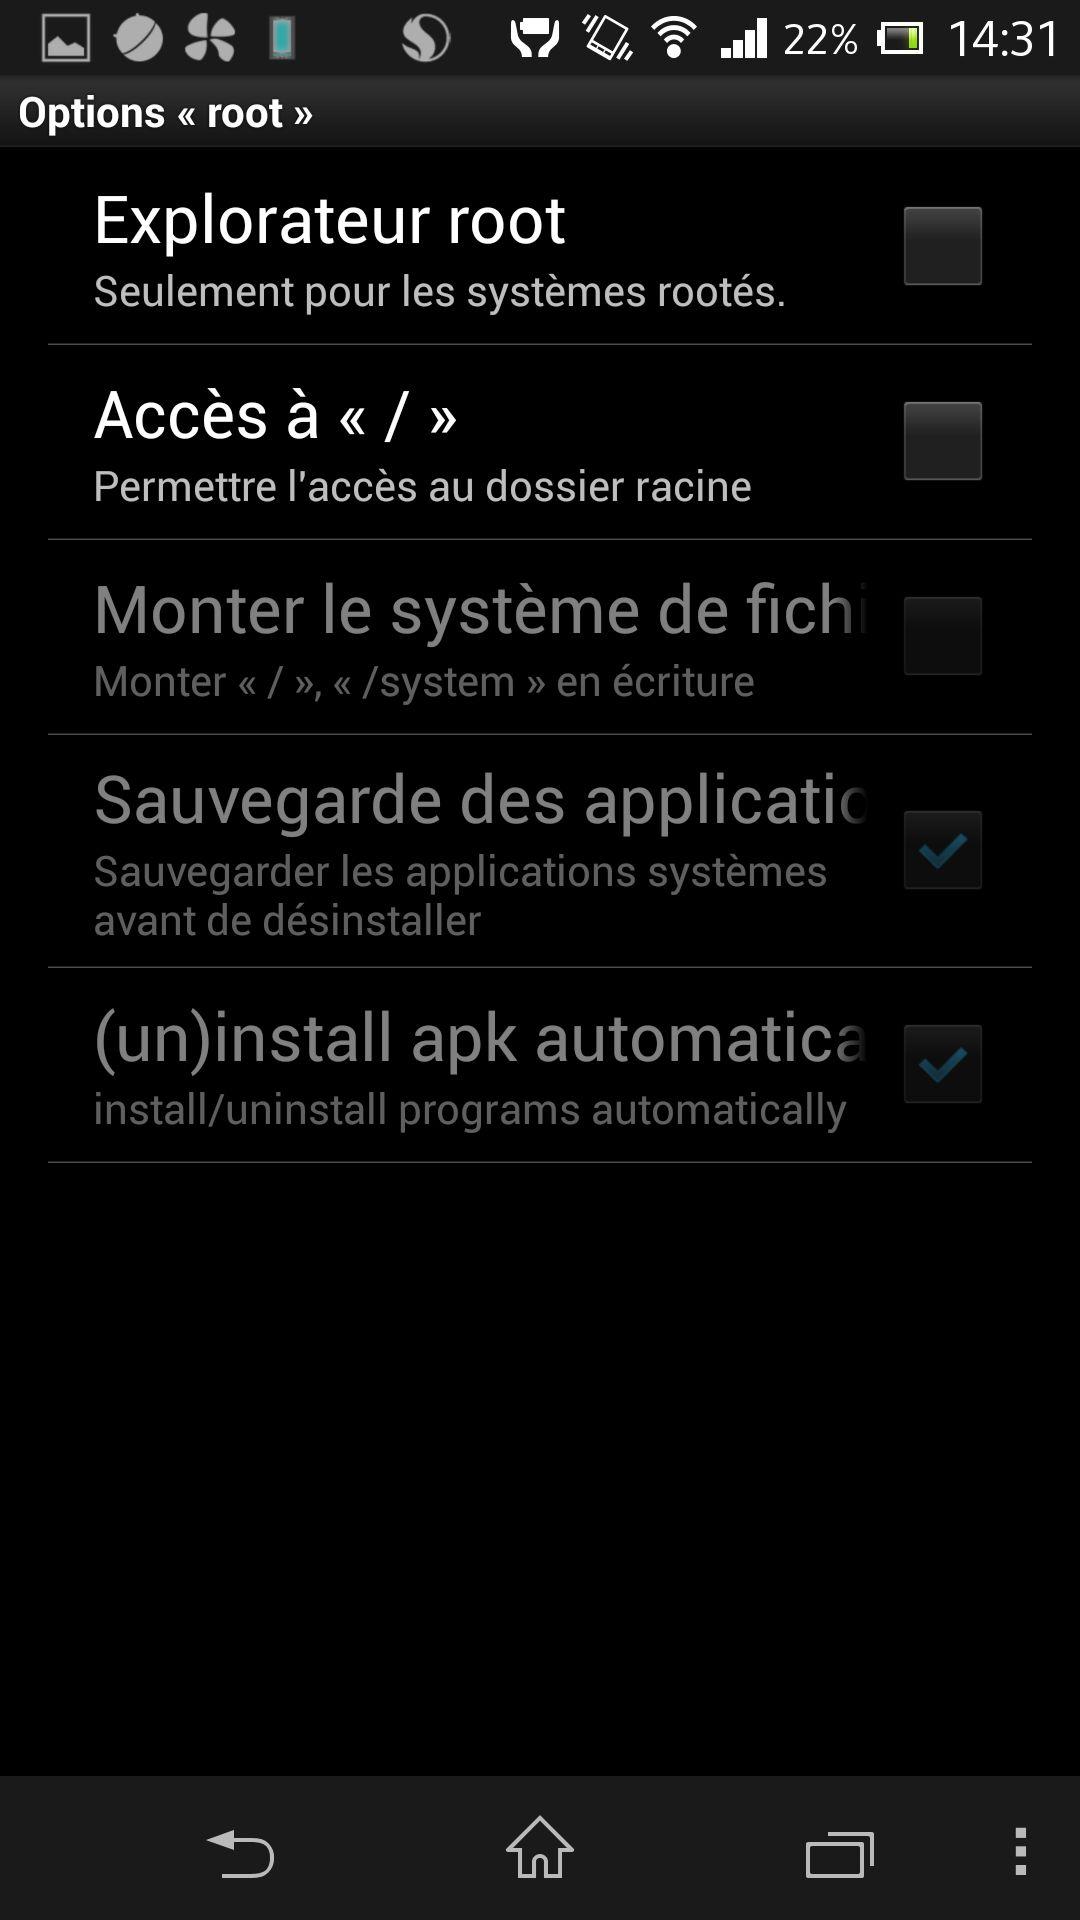 Screenshot_2013-03-18-14-31-15